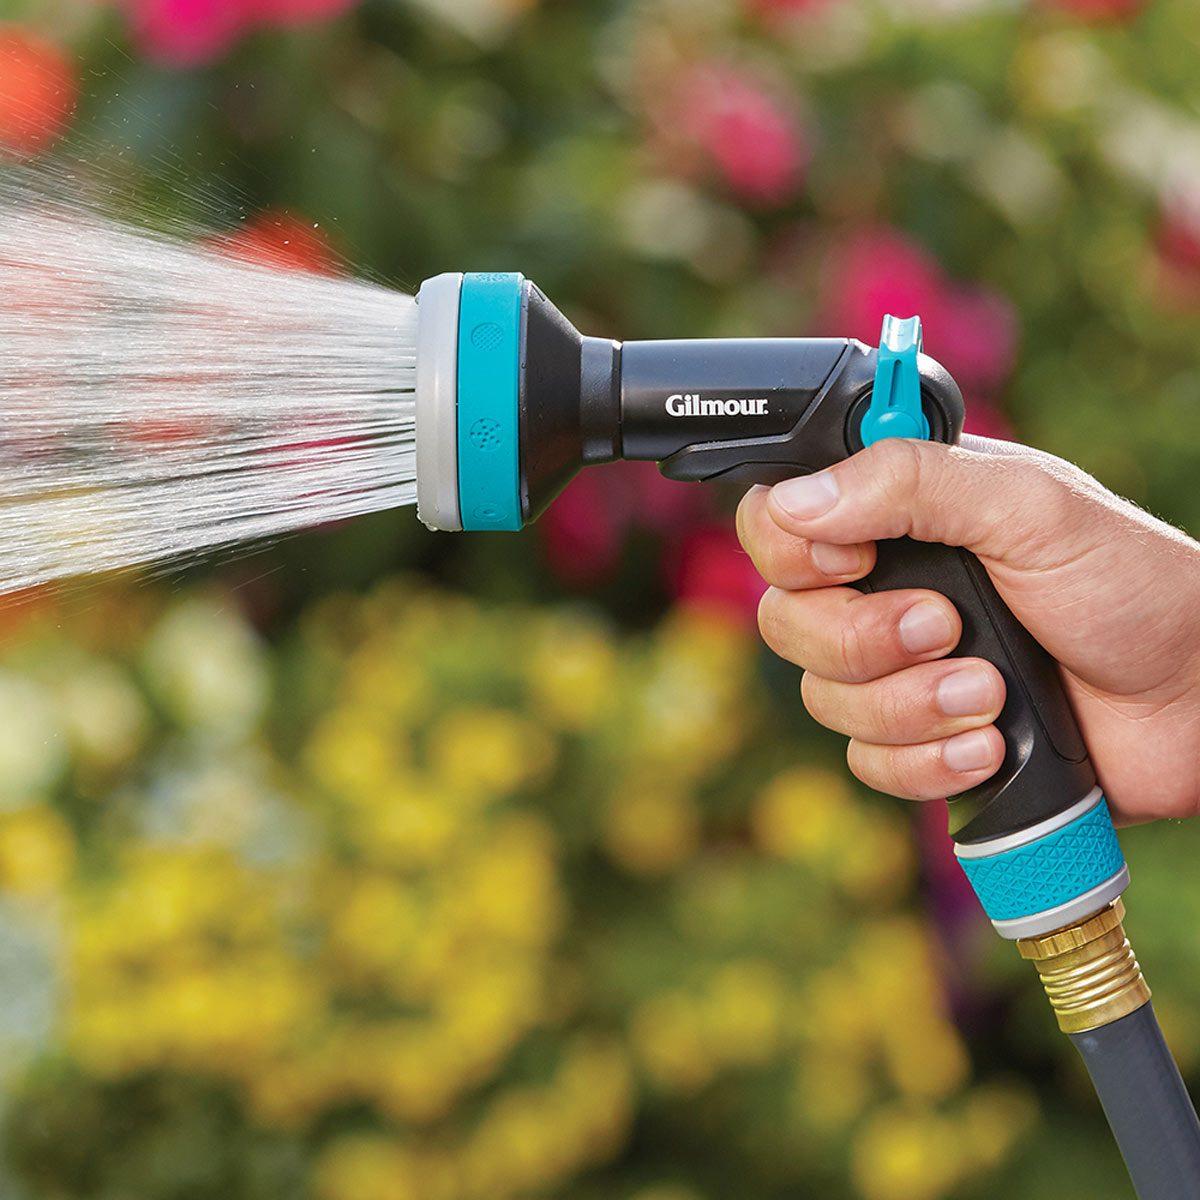 glimour sprinkler head